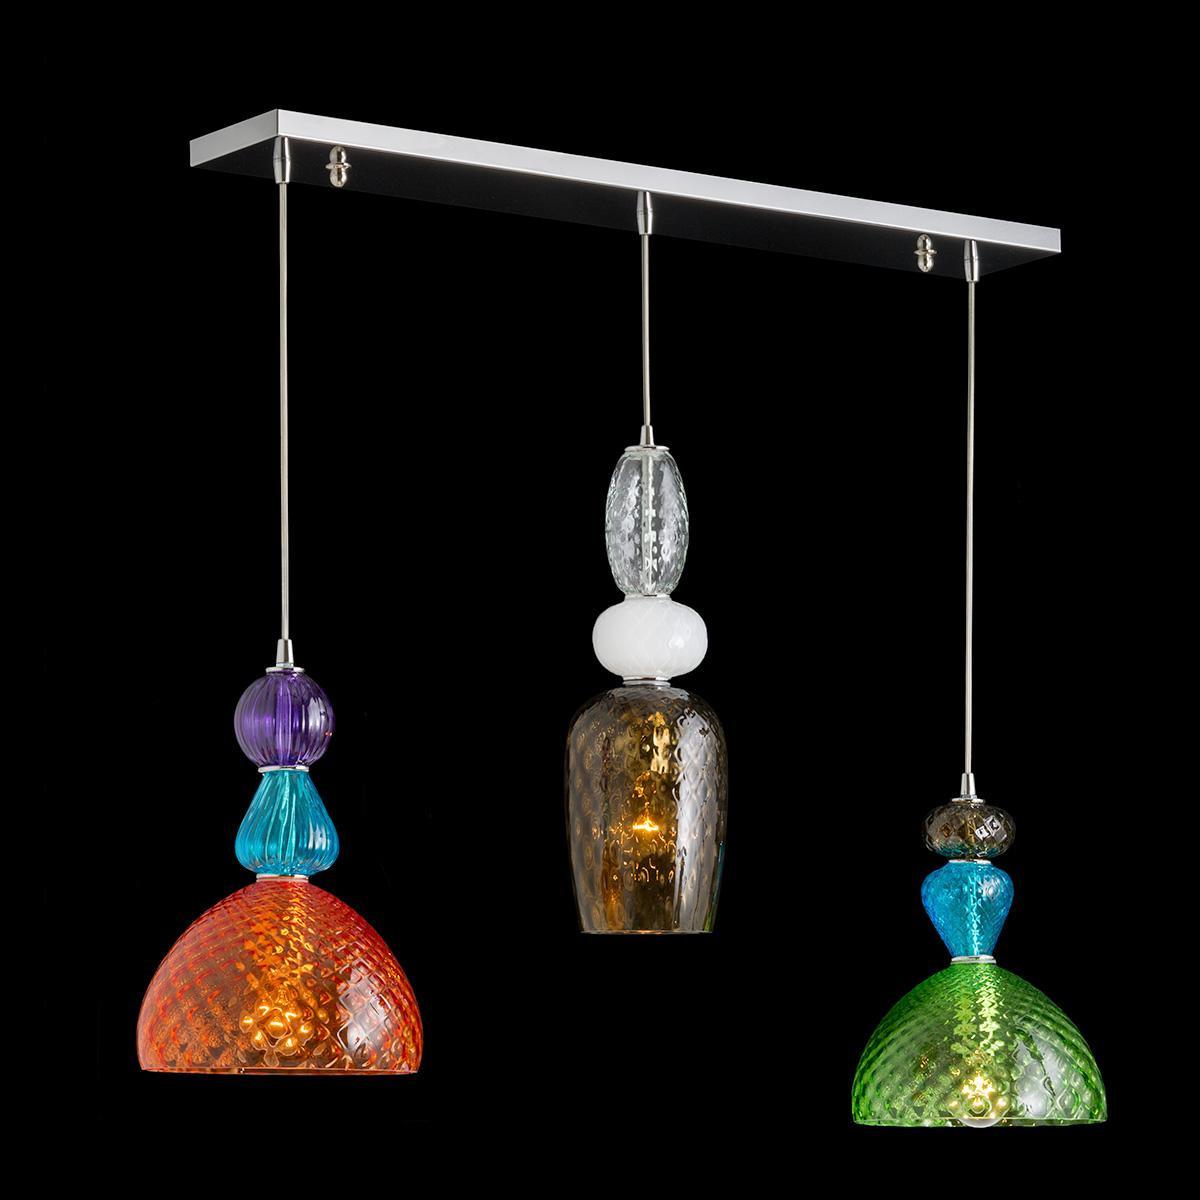 """Mavis"" Murano glas hangeleuchte - 3 flammig - multicolor"